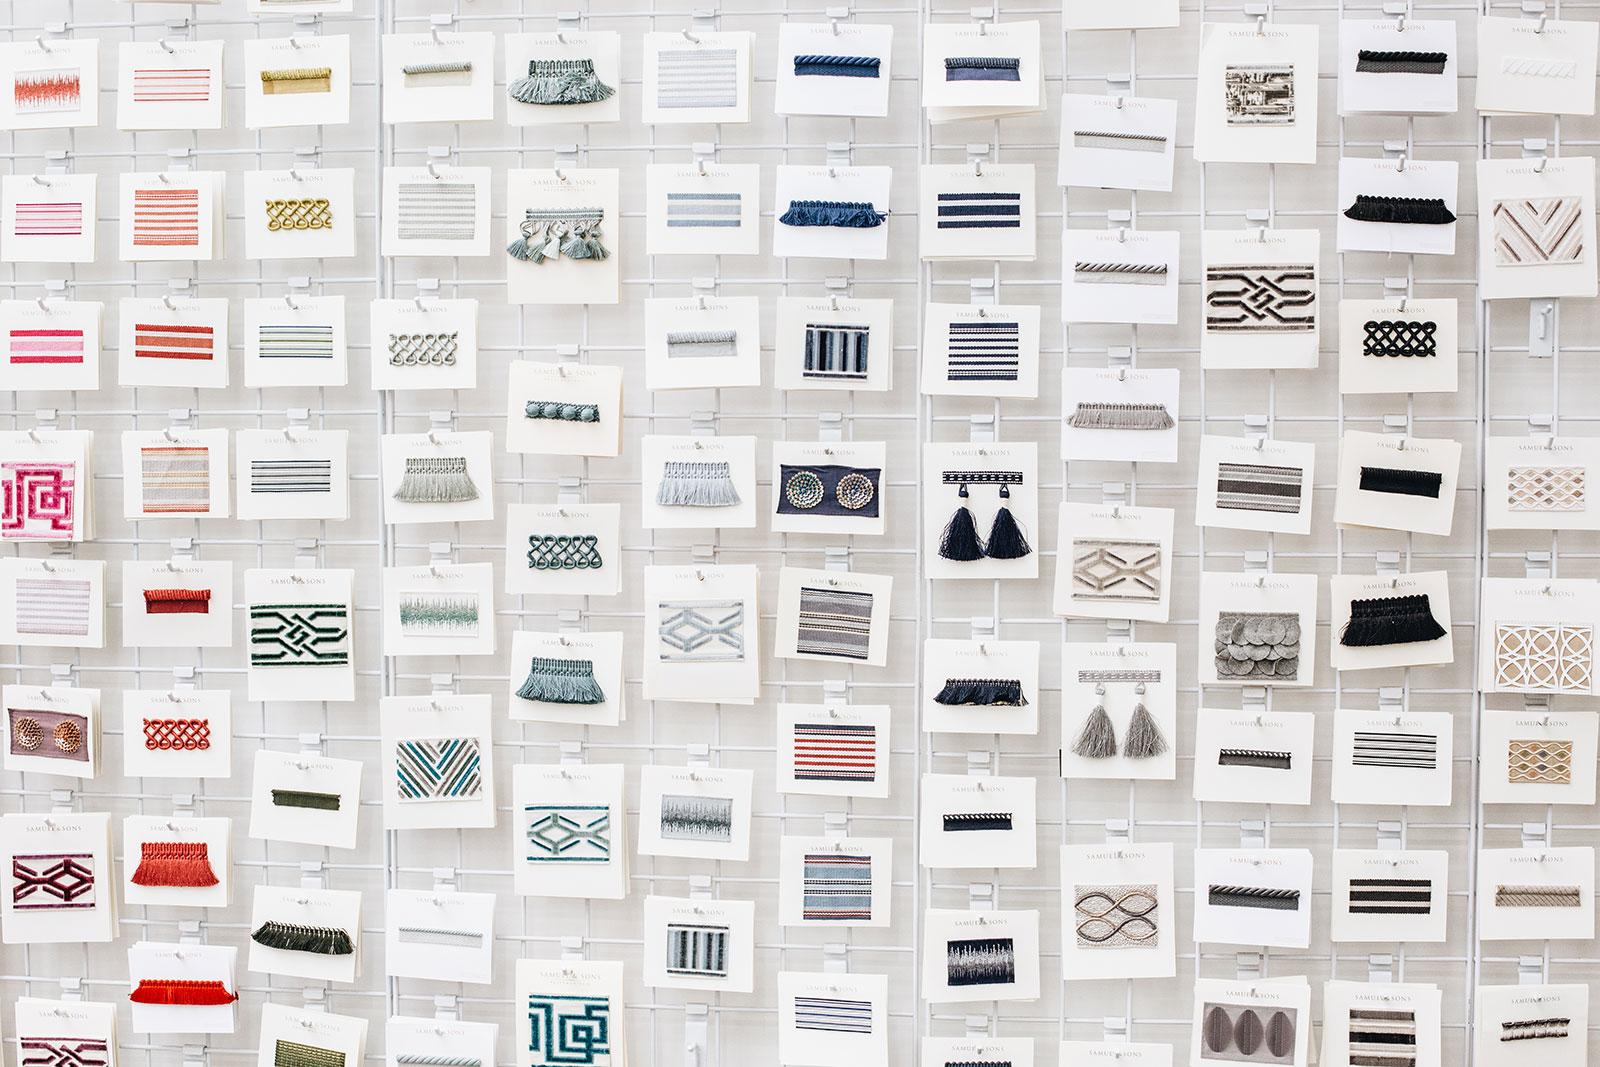 drc-interior-designer-company-branding_17.jpg